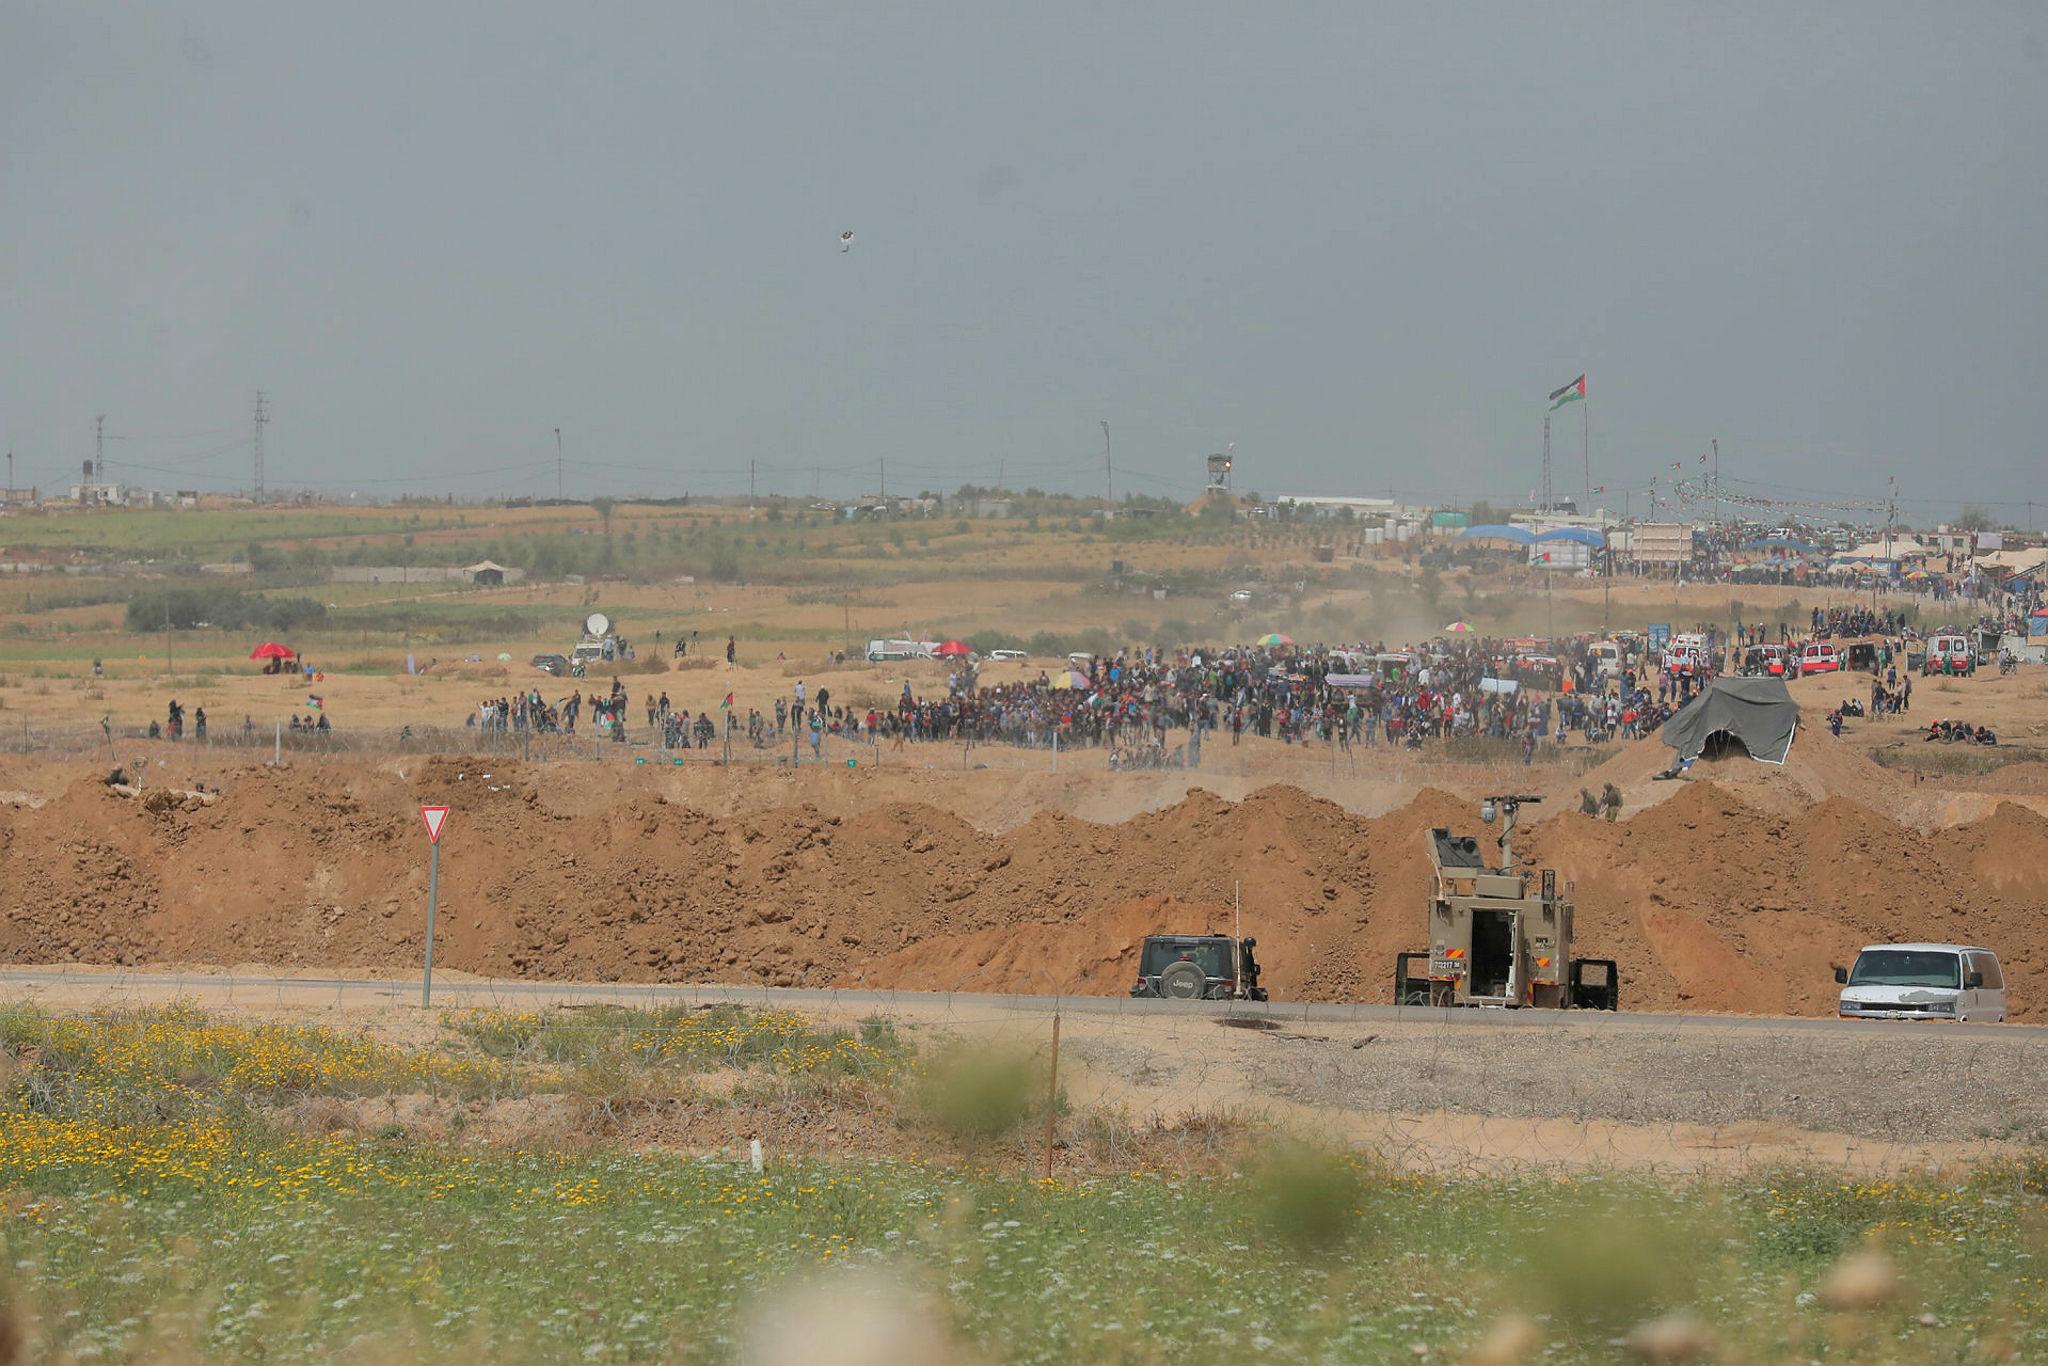 Alertness on the border of Gaza and Israel